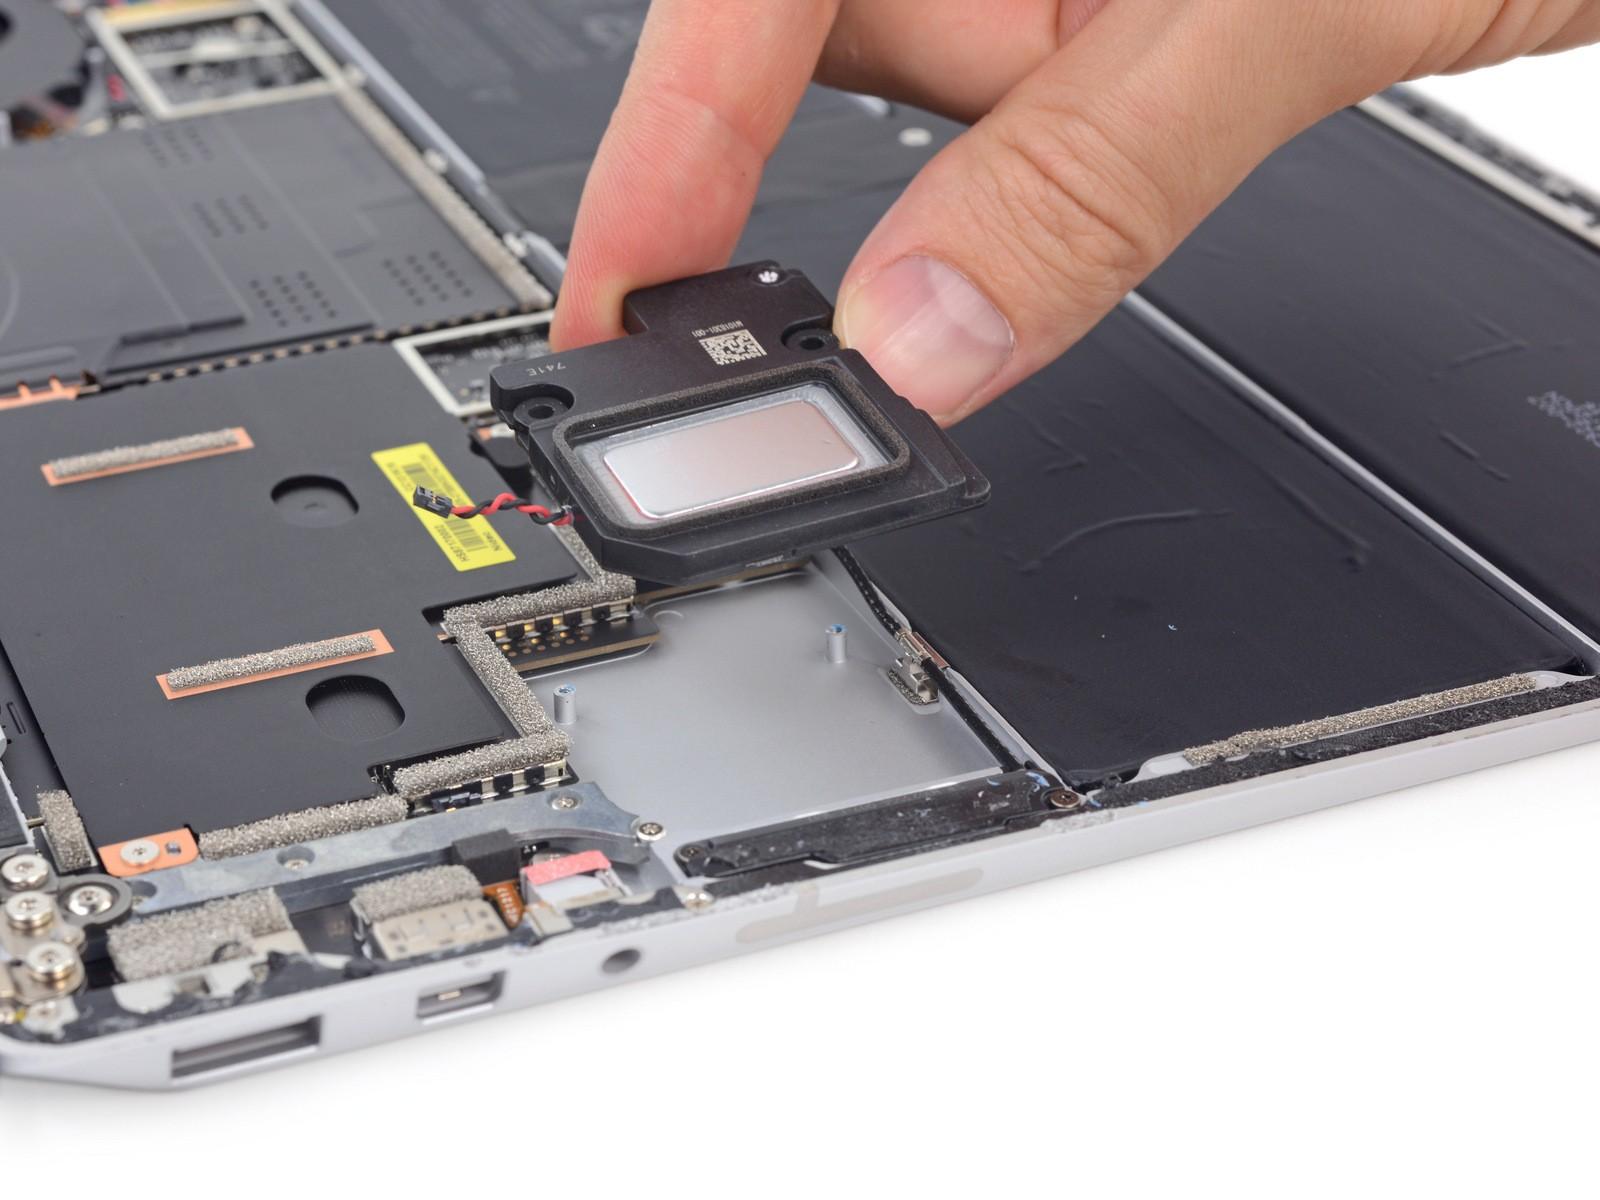 Microsoft Surface Laptop Gets 0 Repairability Score in iFixit Teardown